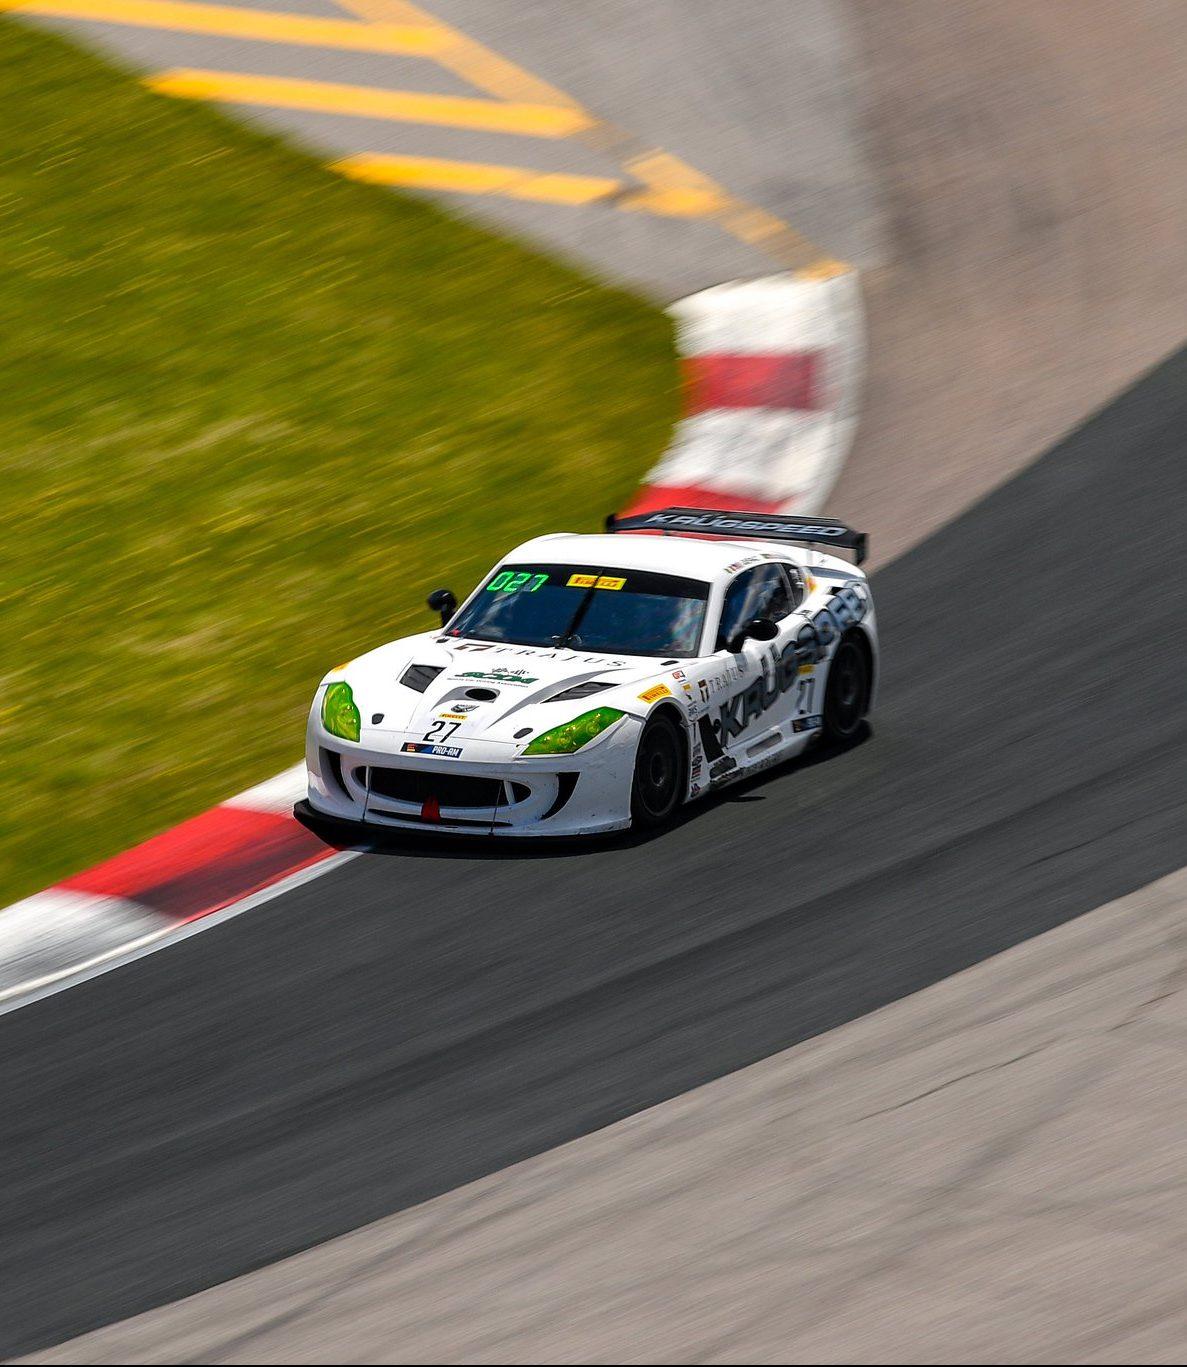 SCDA's Elivan Goulart wins both World Challenge GT-4East races at Canadian Tire Motorsports Park